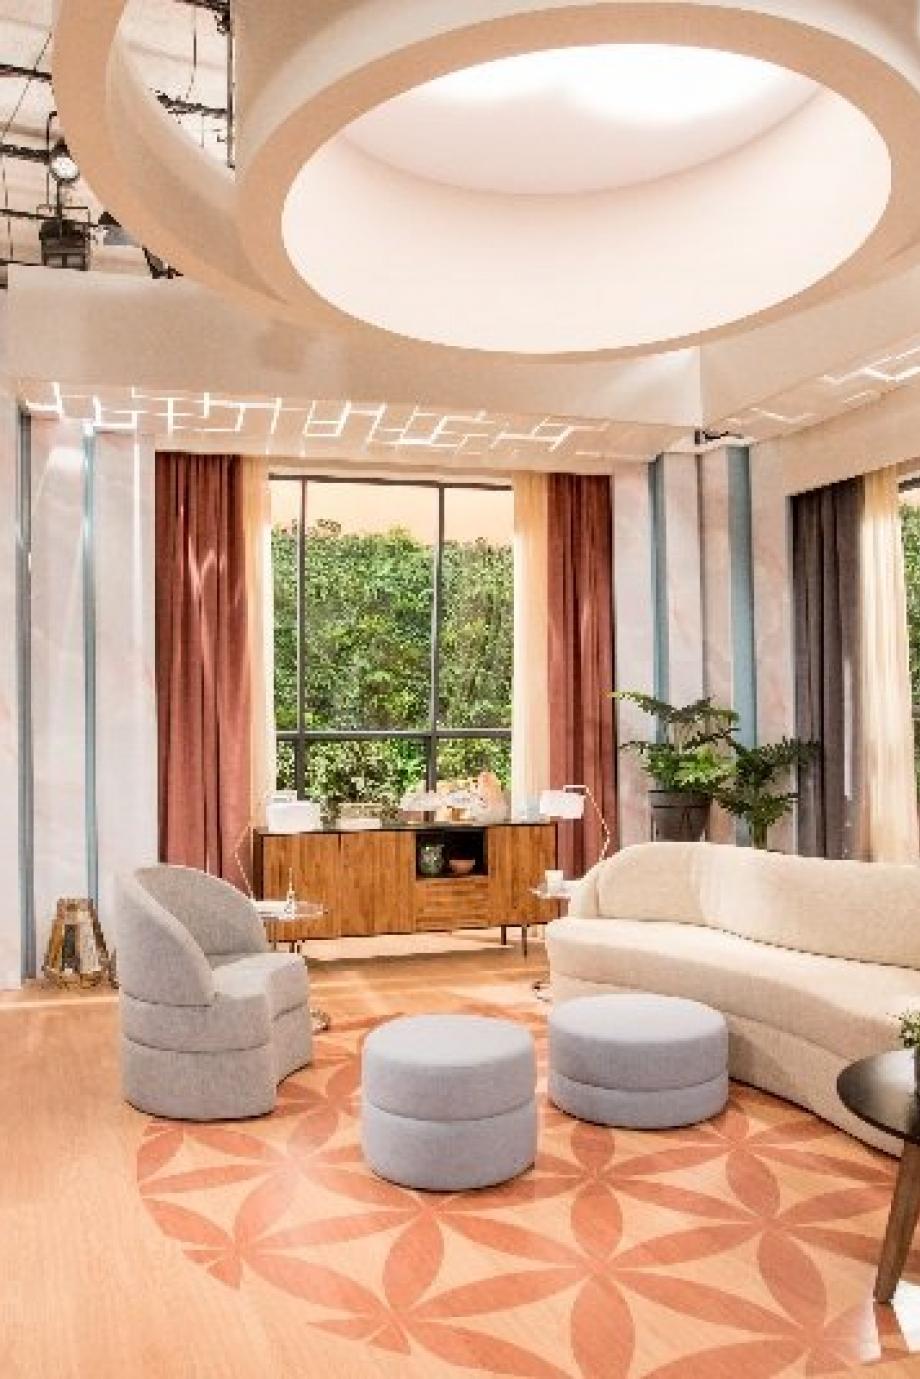 LisboaCool_Blog_Lisboa vai ter um TV Hotel!